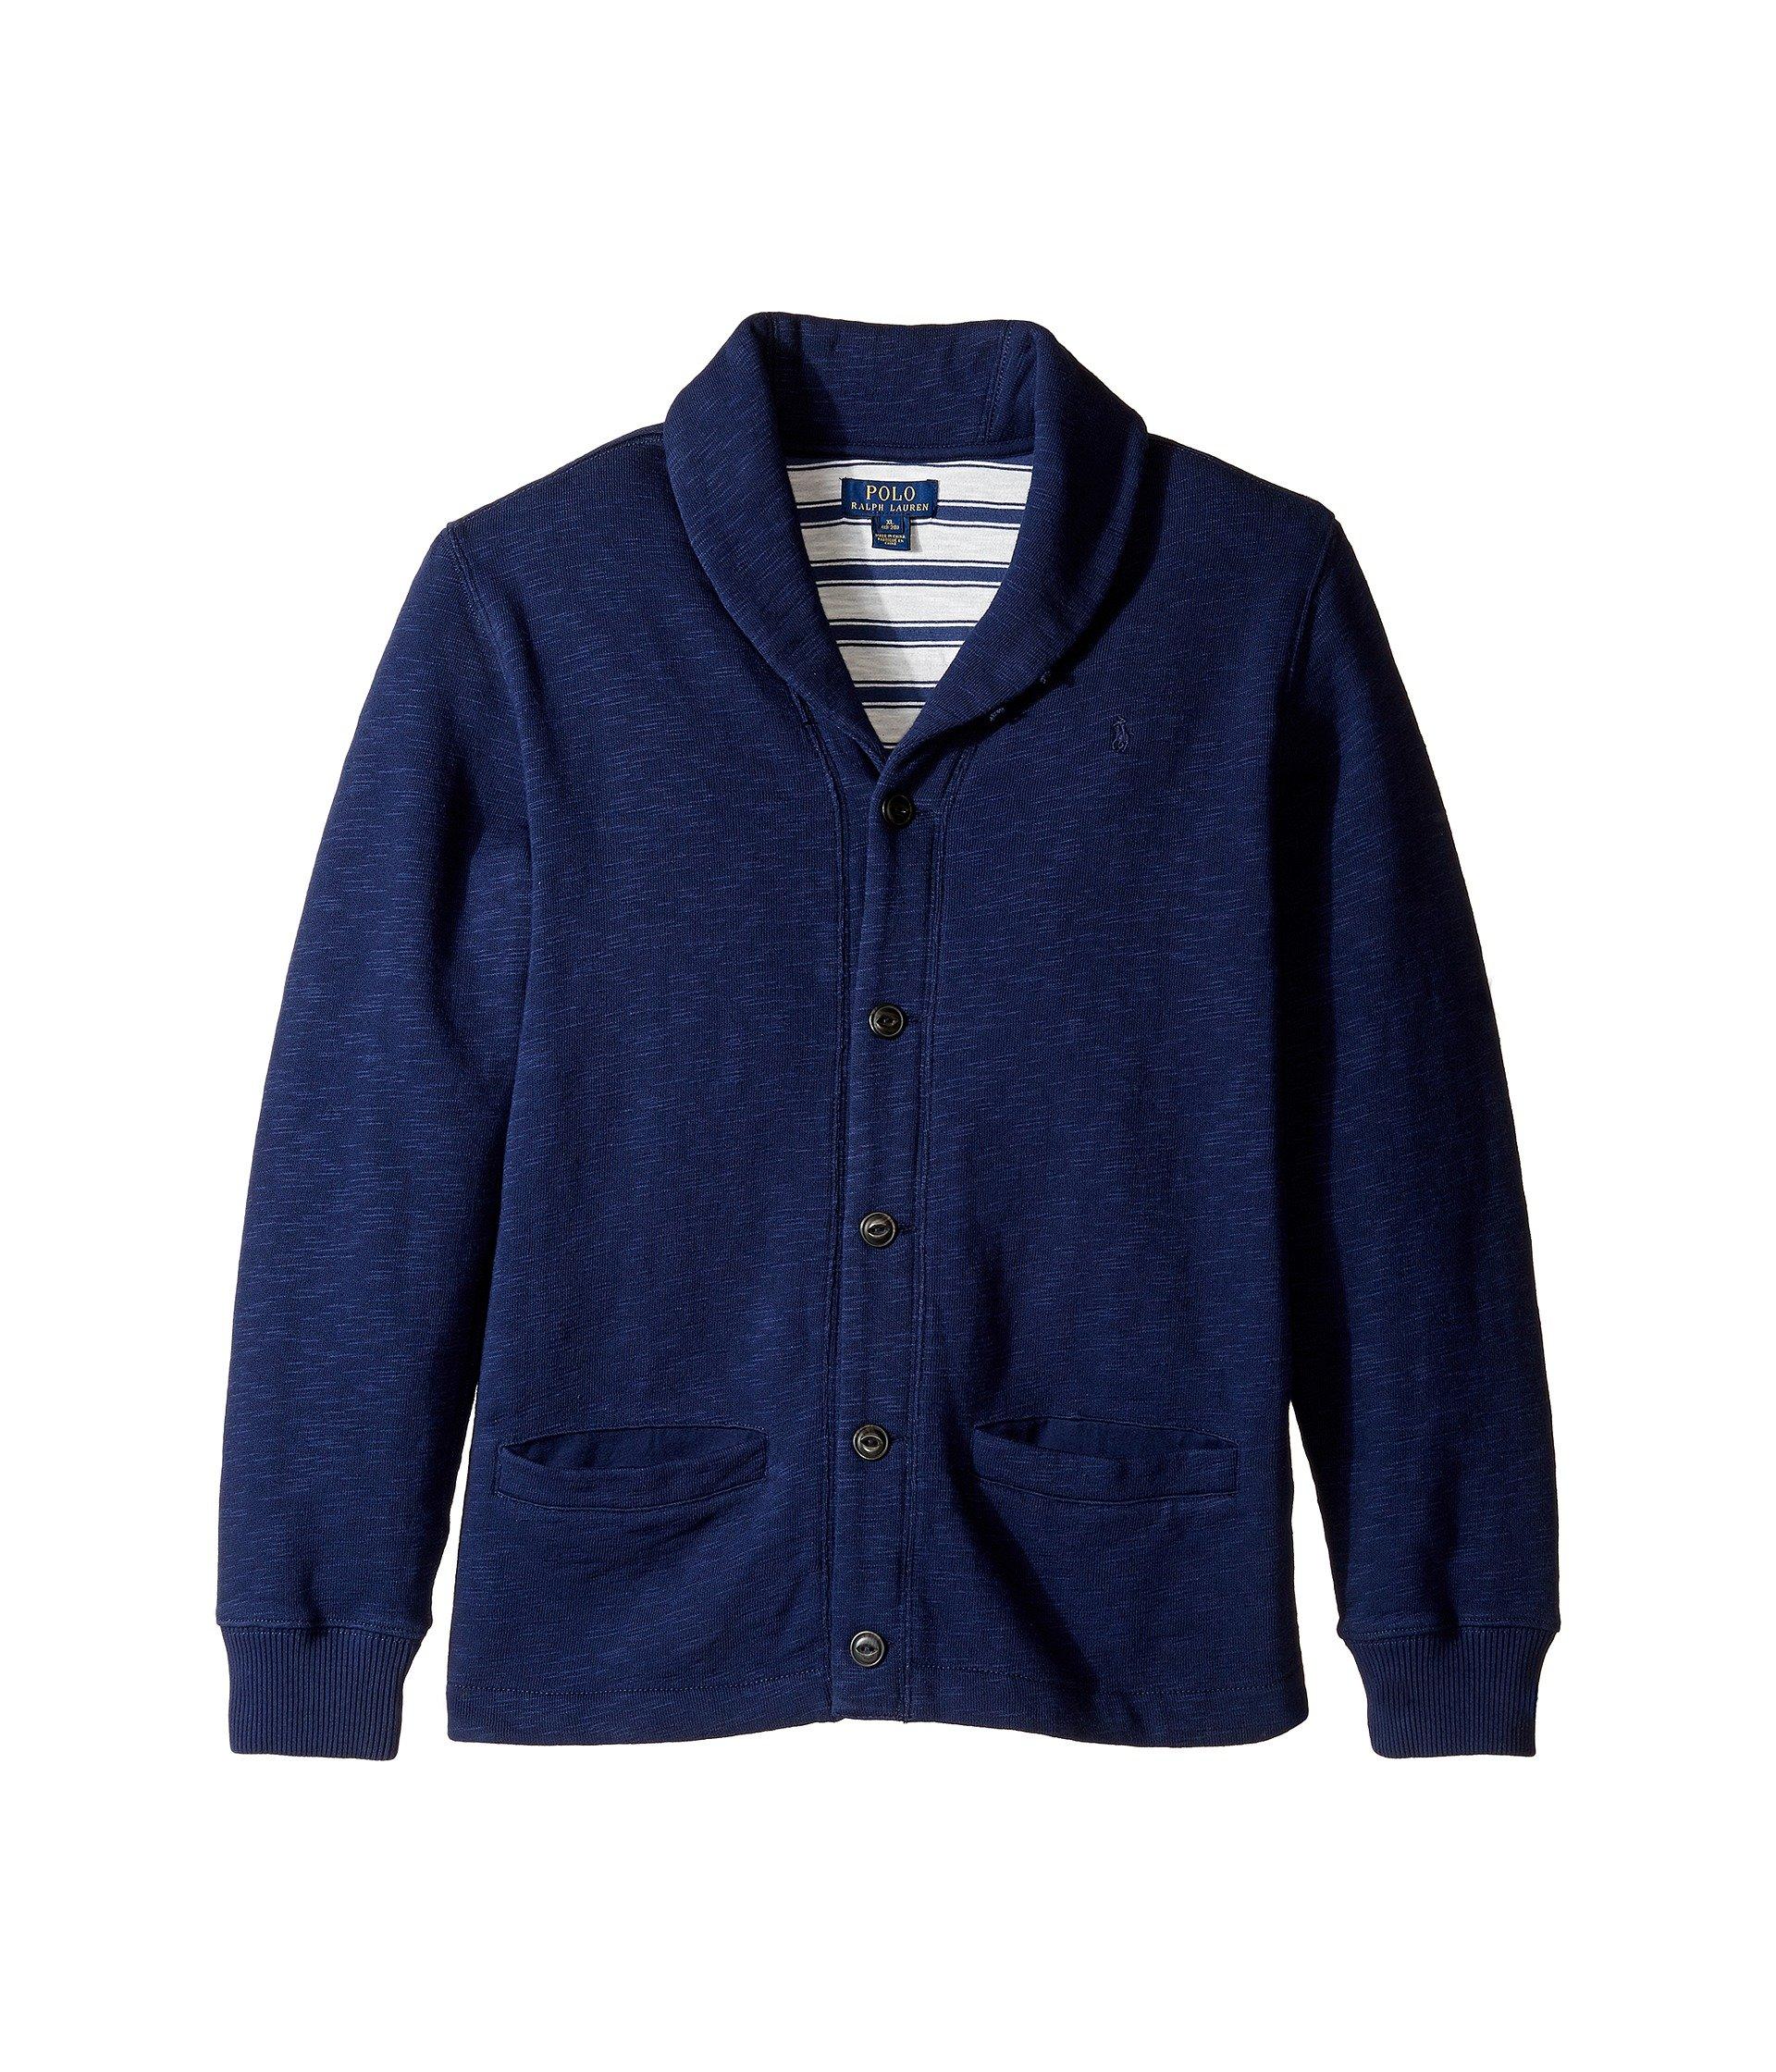 Ralph Lauren Boys Slub Fleece Shawl Collar Cardigan Jacket Small 8 by Ralph Lauren